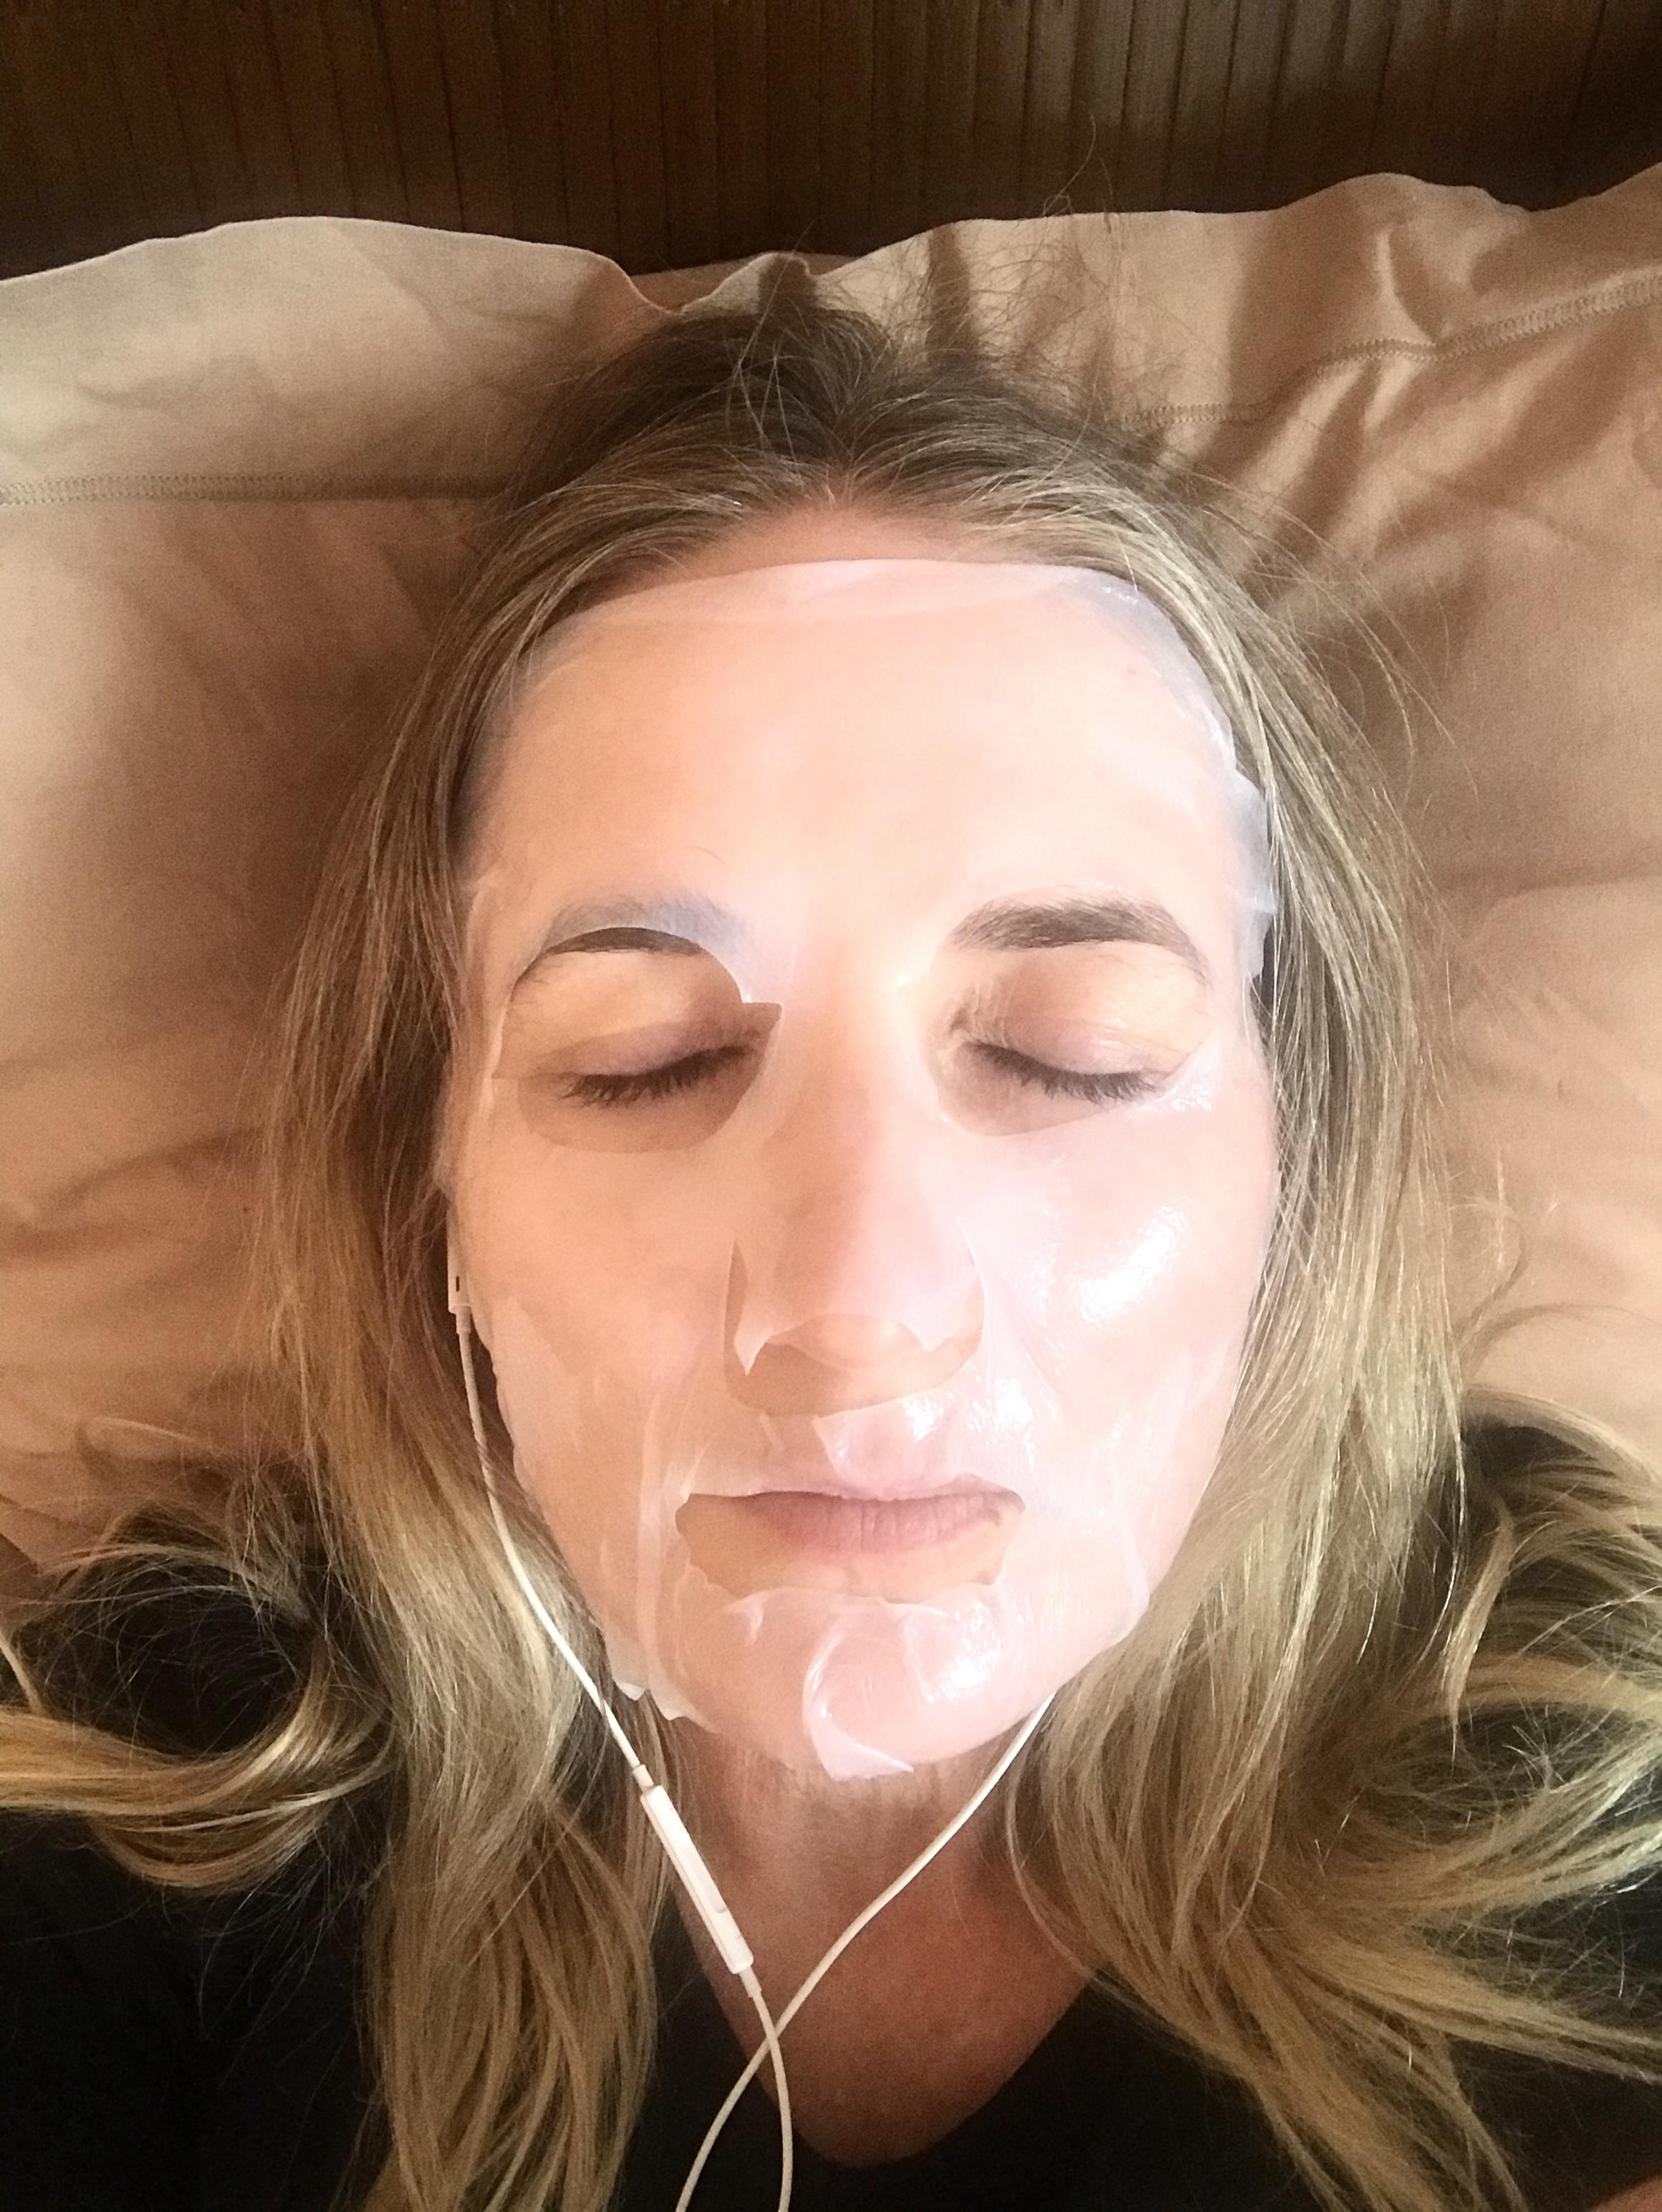 sophro-masque-sophrologie-cosmetique-